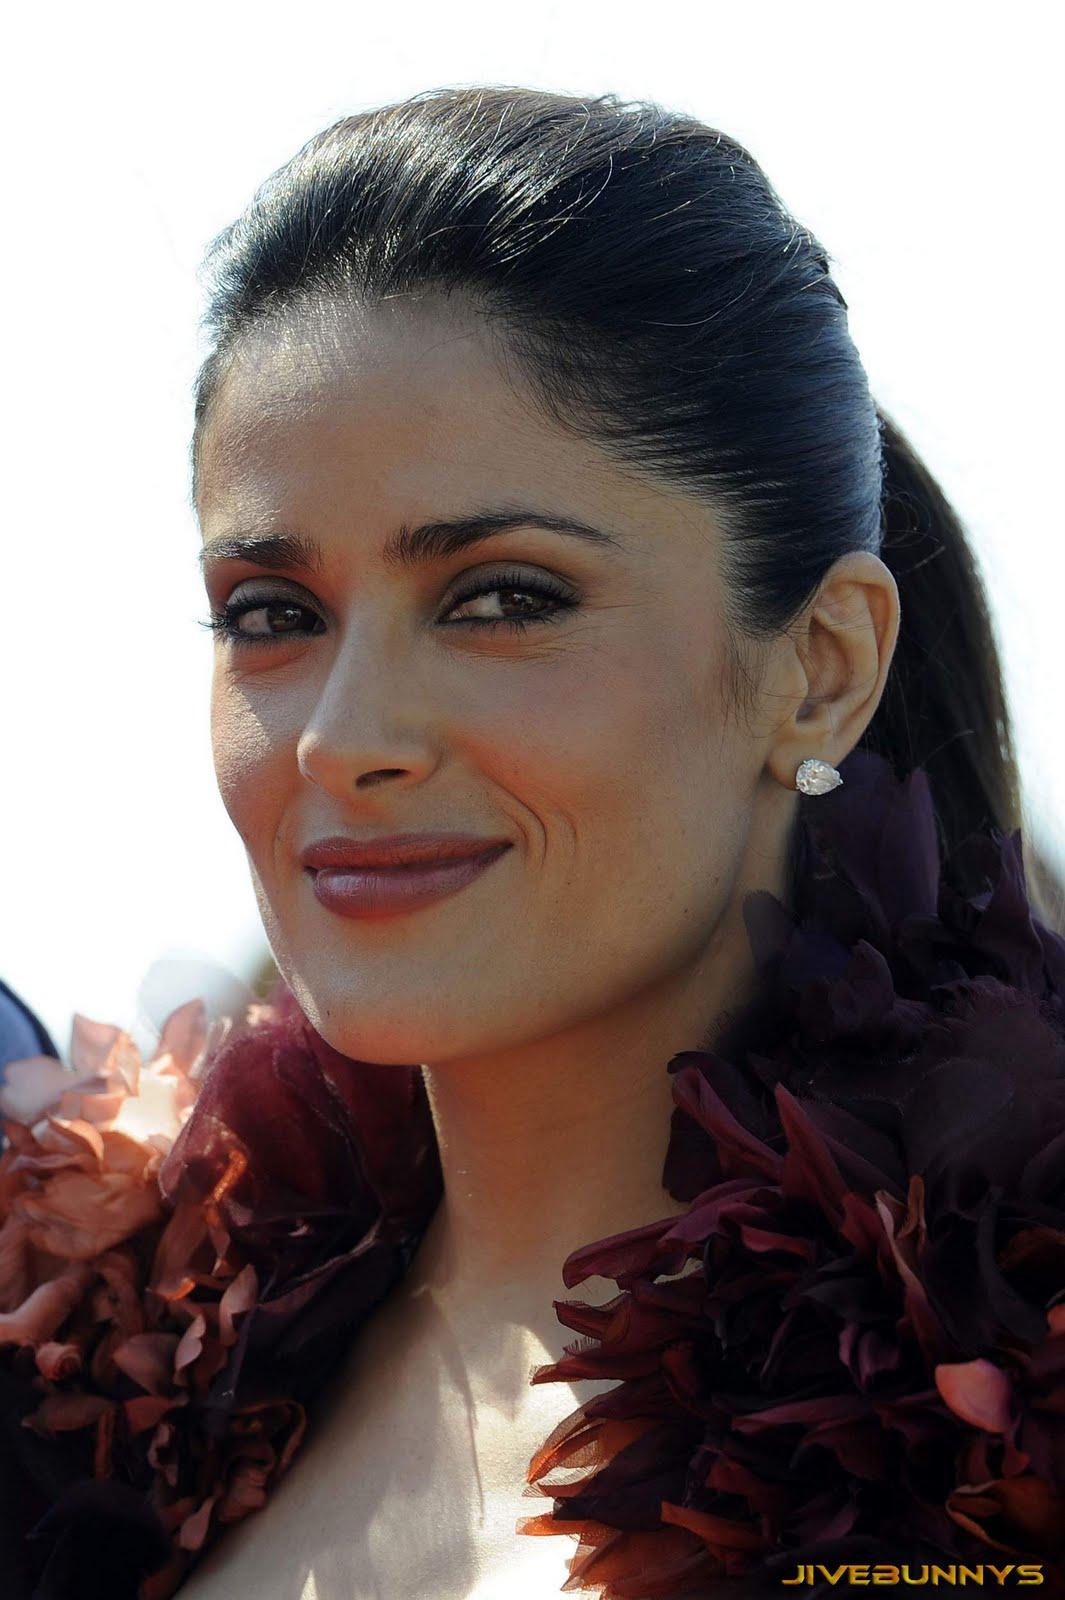 http://3.bp.blogspot.com/-HPsgT5z-mu4/TdS6Vmh2dKI/AAAAAAACEn0/DDj0DKgZduo/s1600/2-selma-hayak-celebrity-2001.jpg